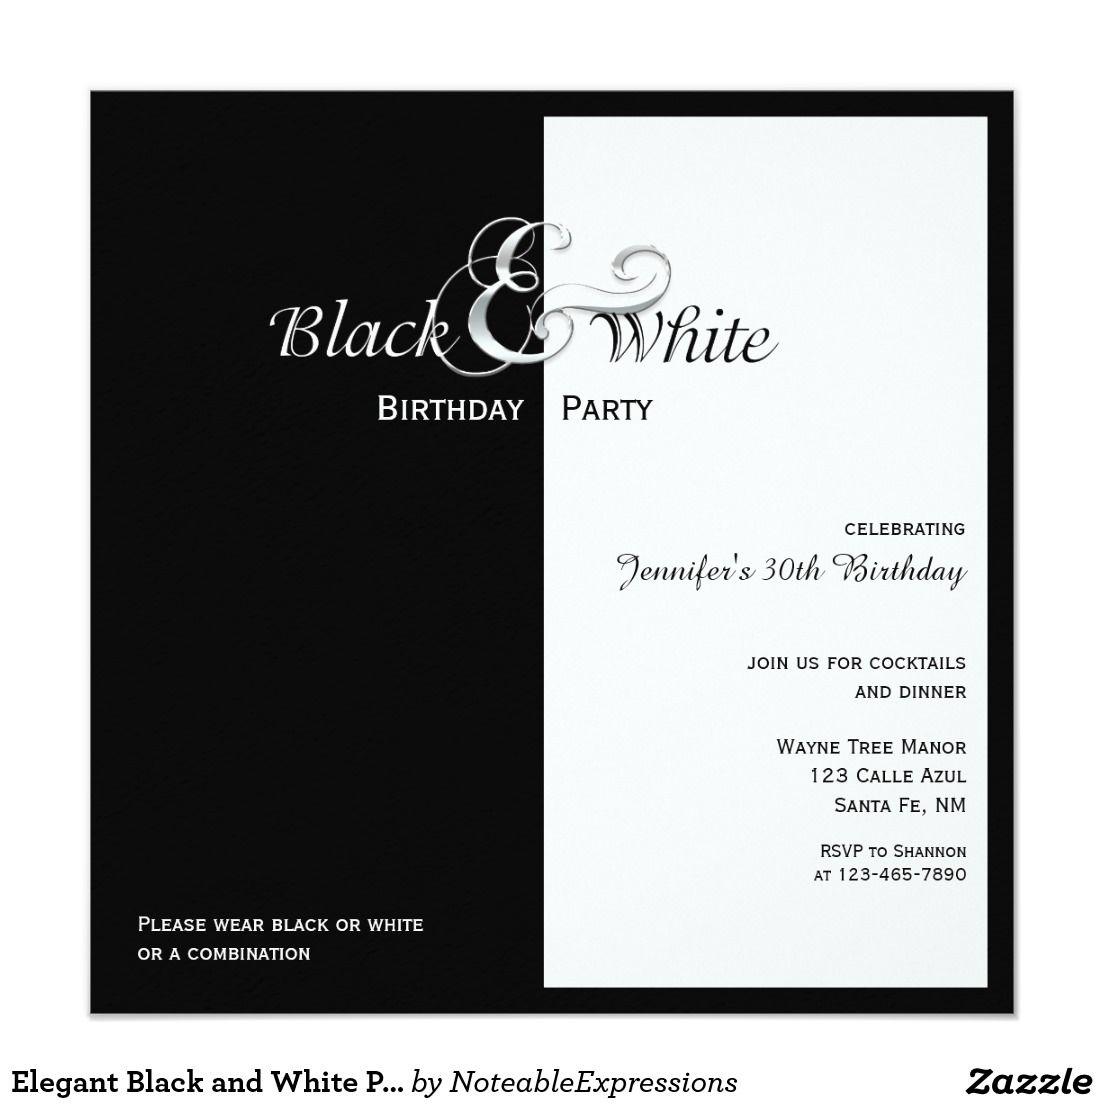 Elegant Black And White Party Invitation Zazzle Com Black